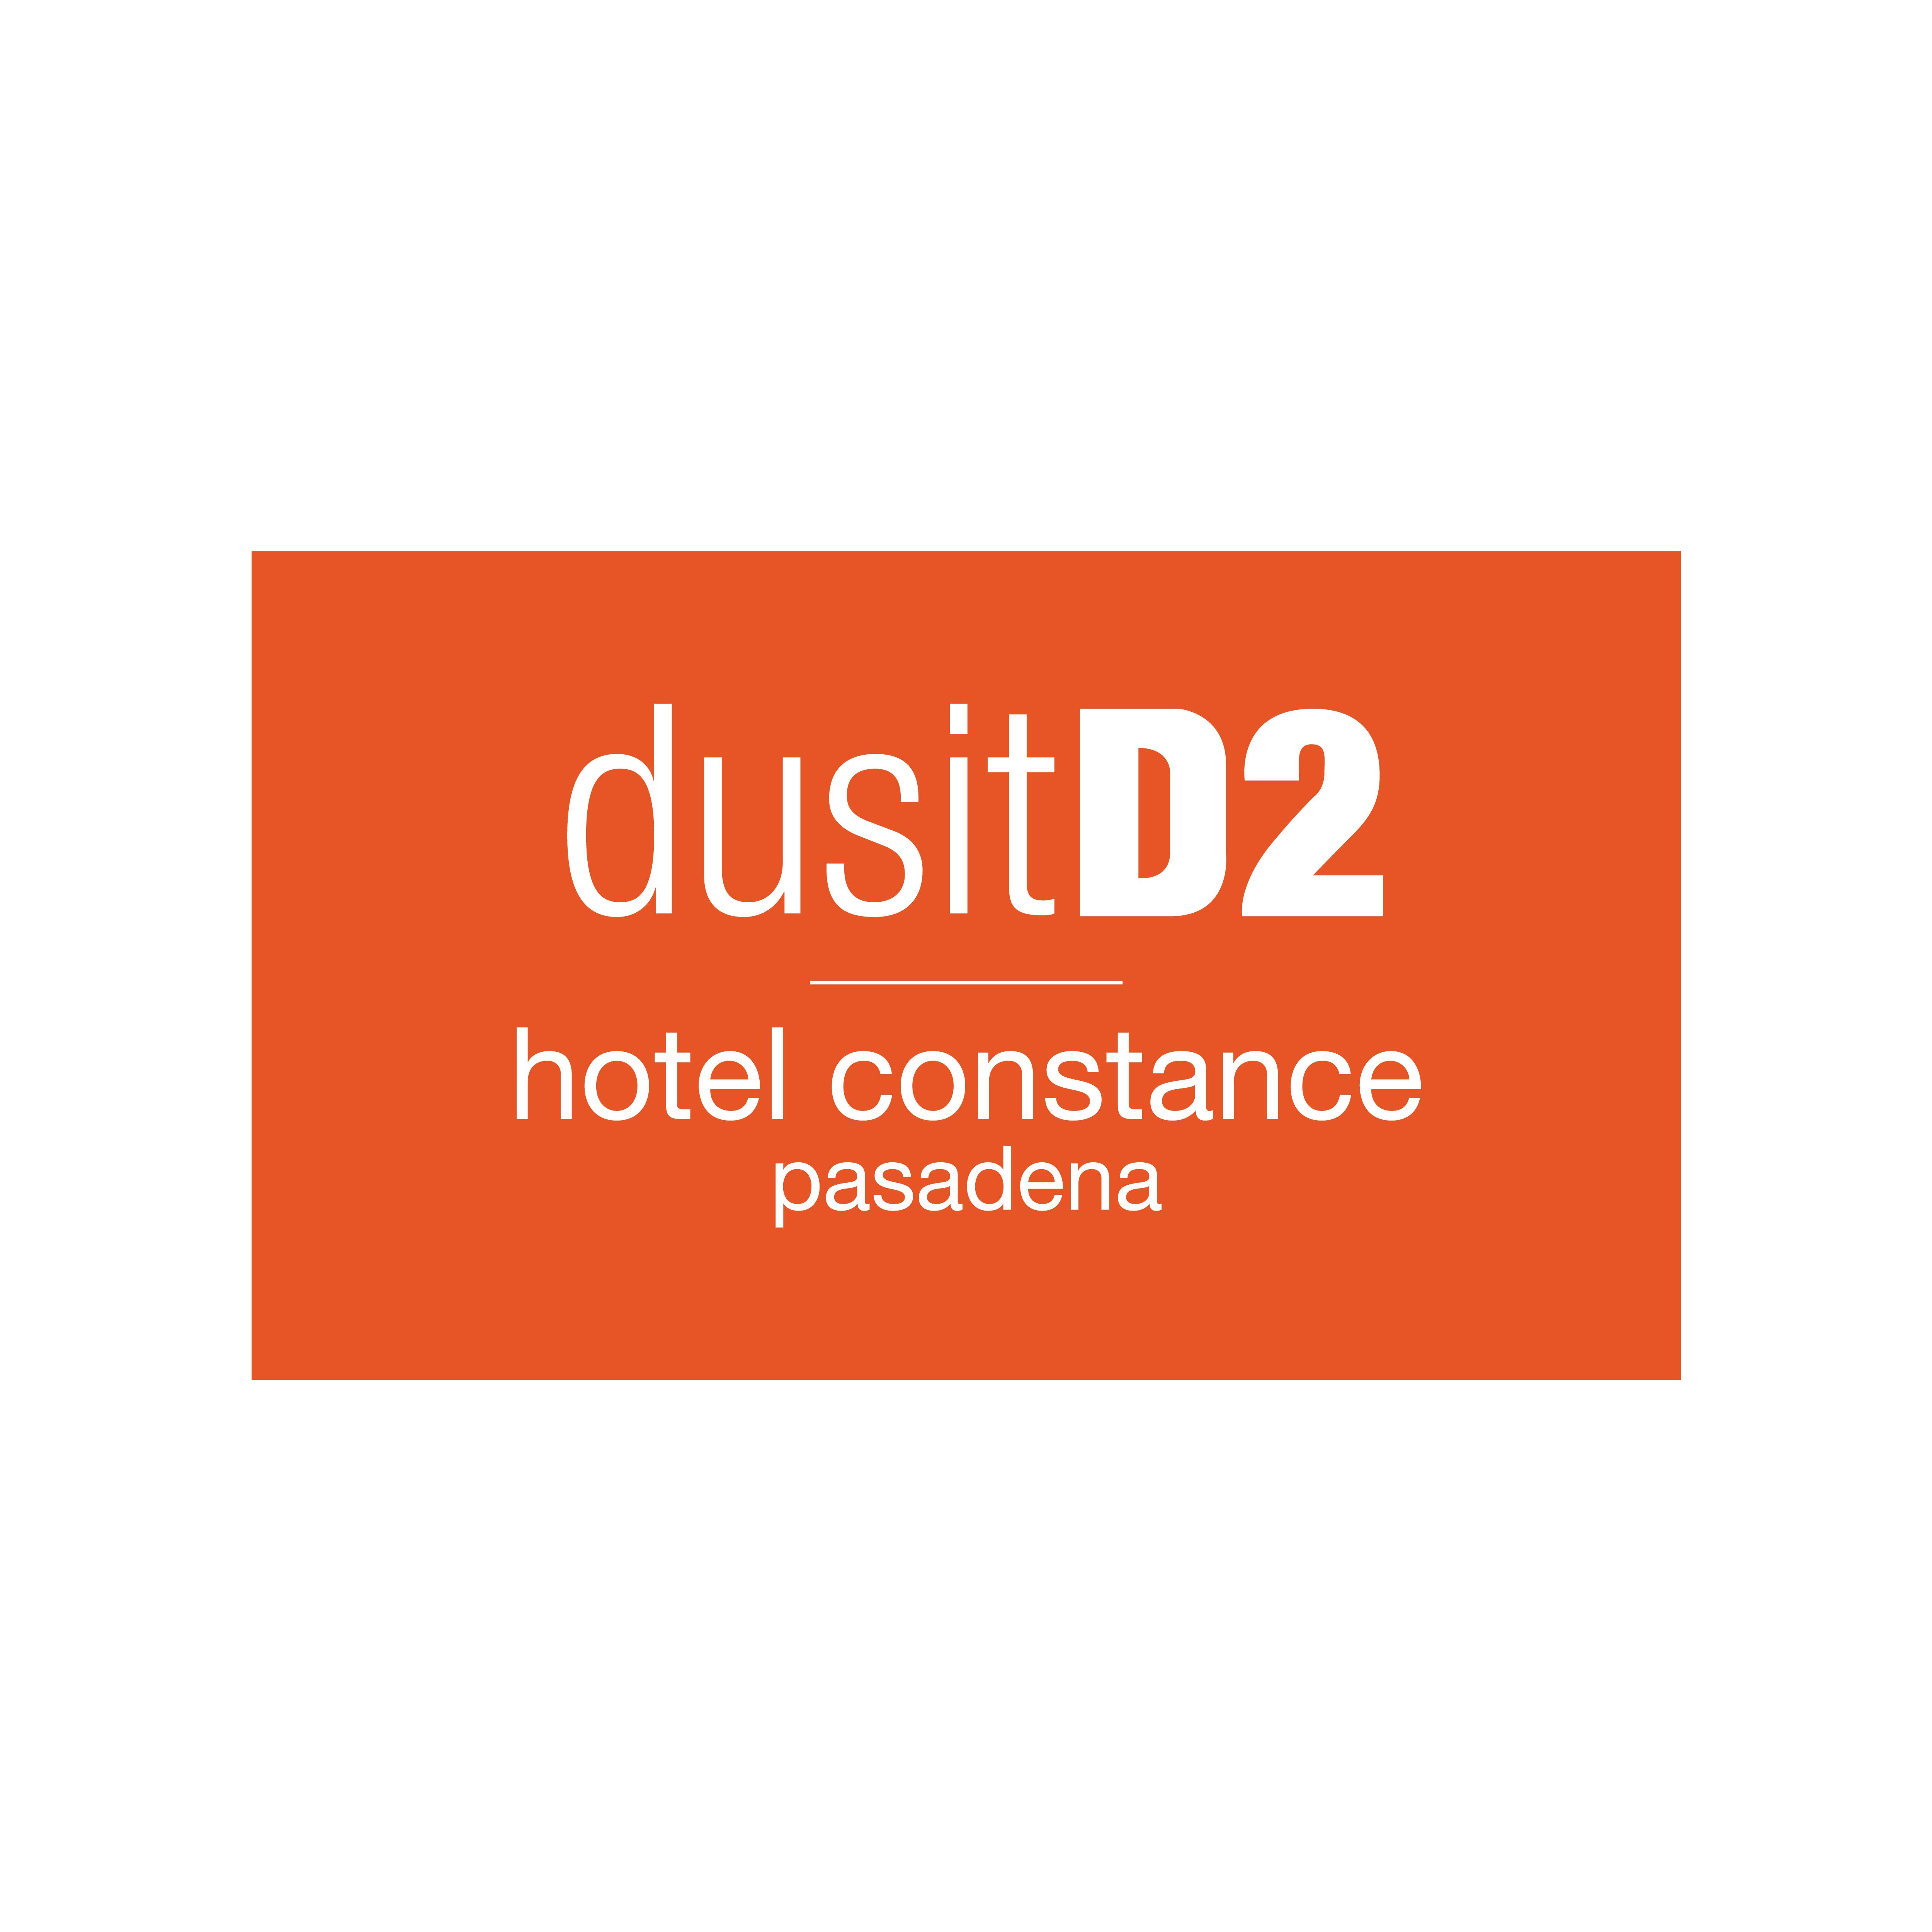 Hotels & Motels in CA Pasadena 91106 dusitD2 Hotel Constance Pasadena 928 E. Colorado Blvd  (626)898-7900